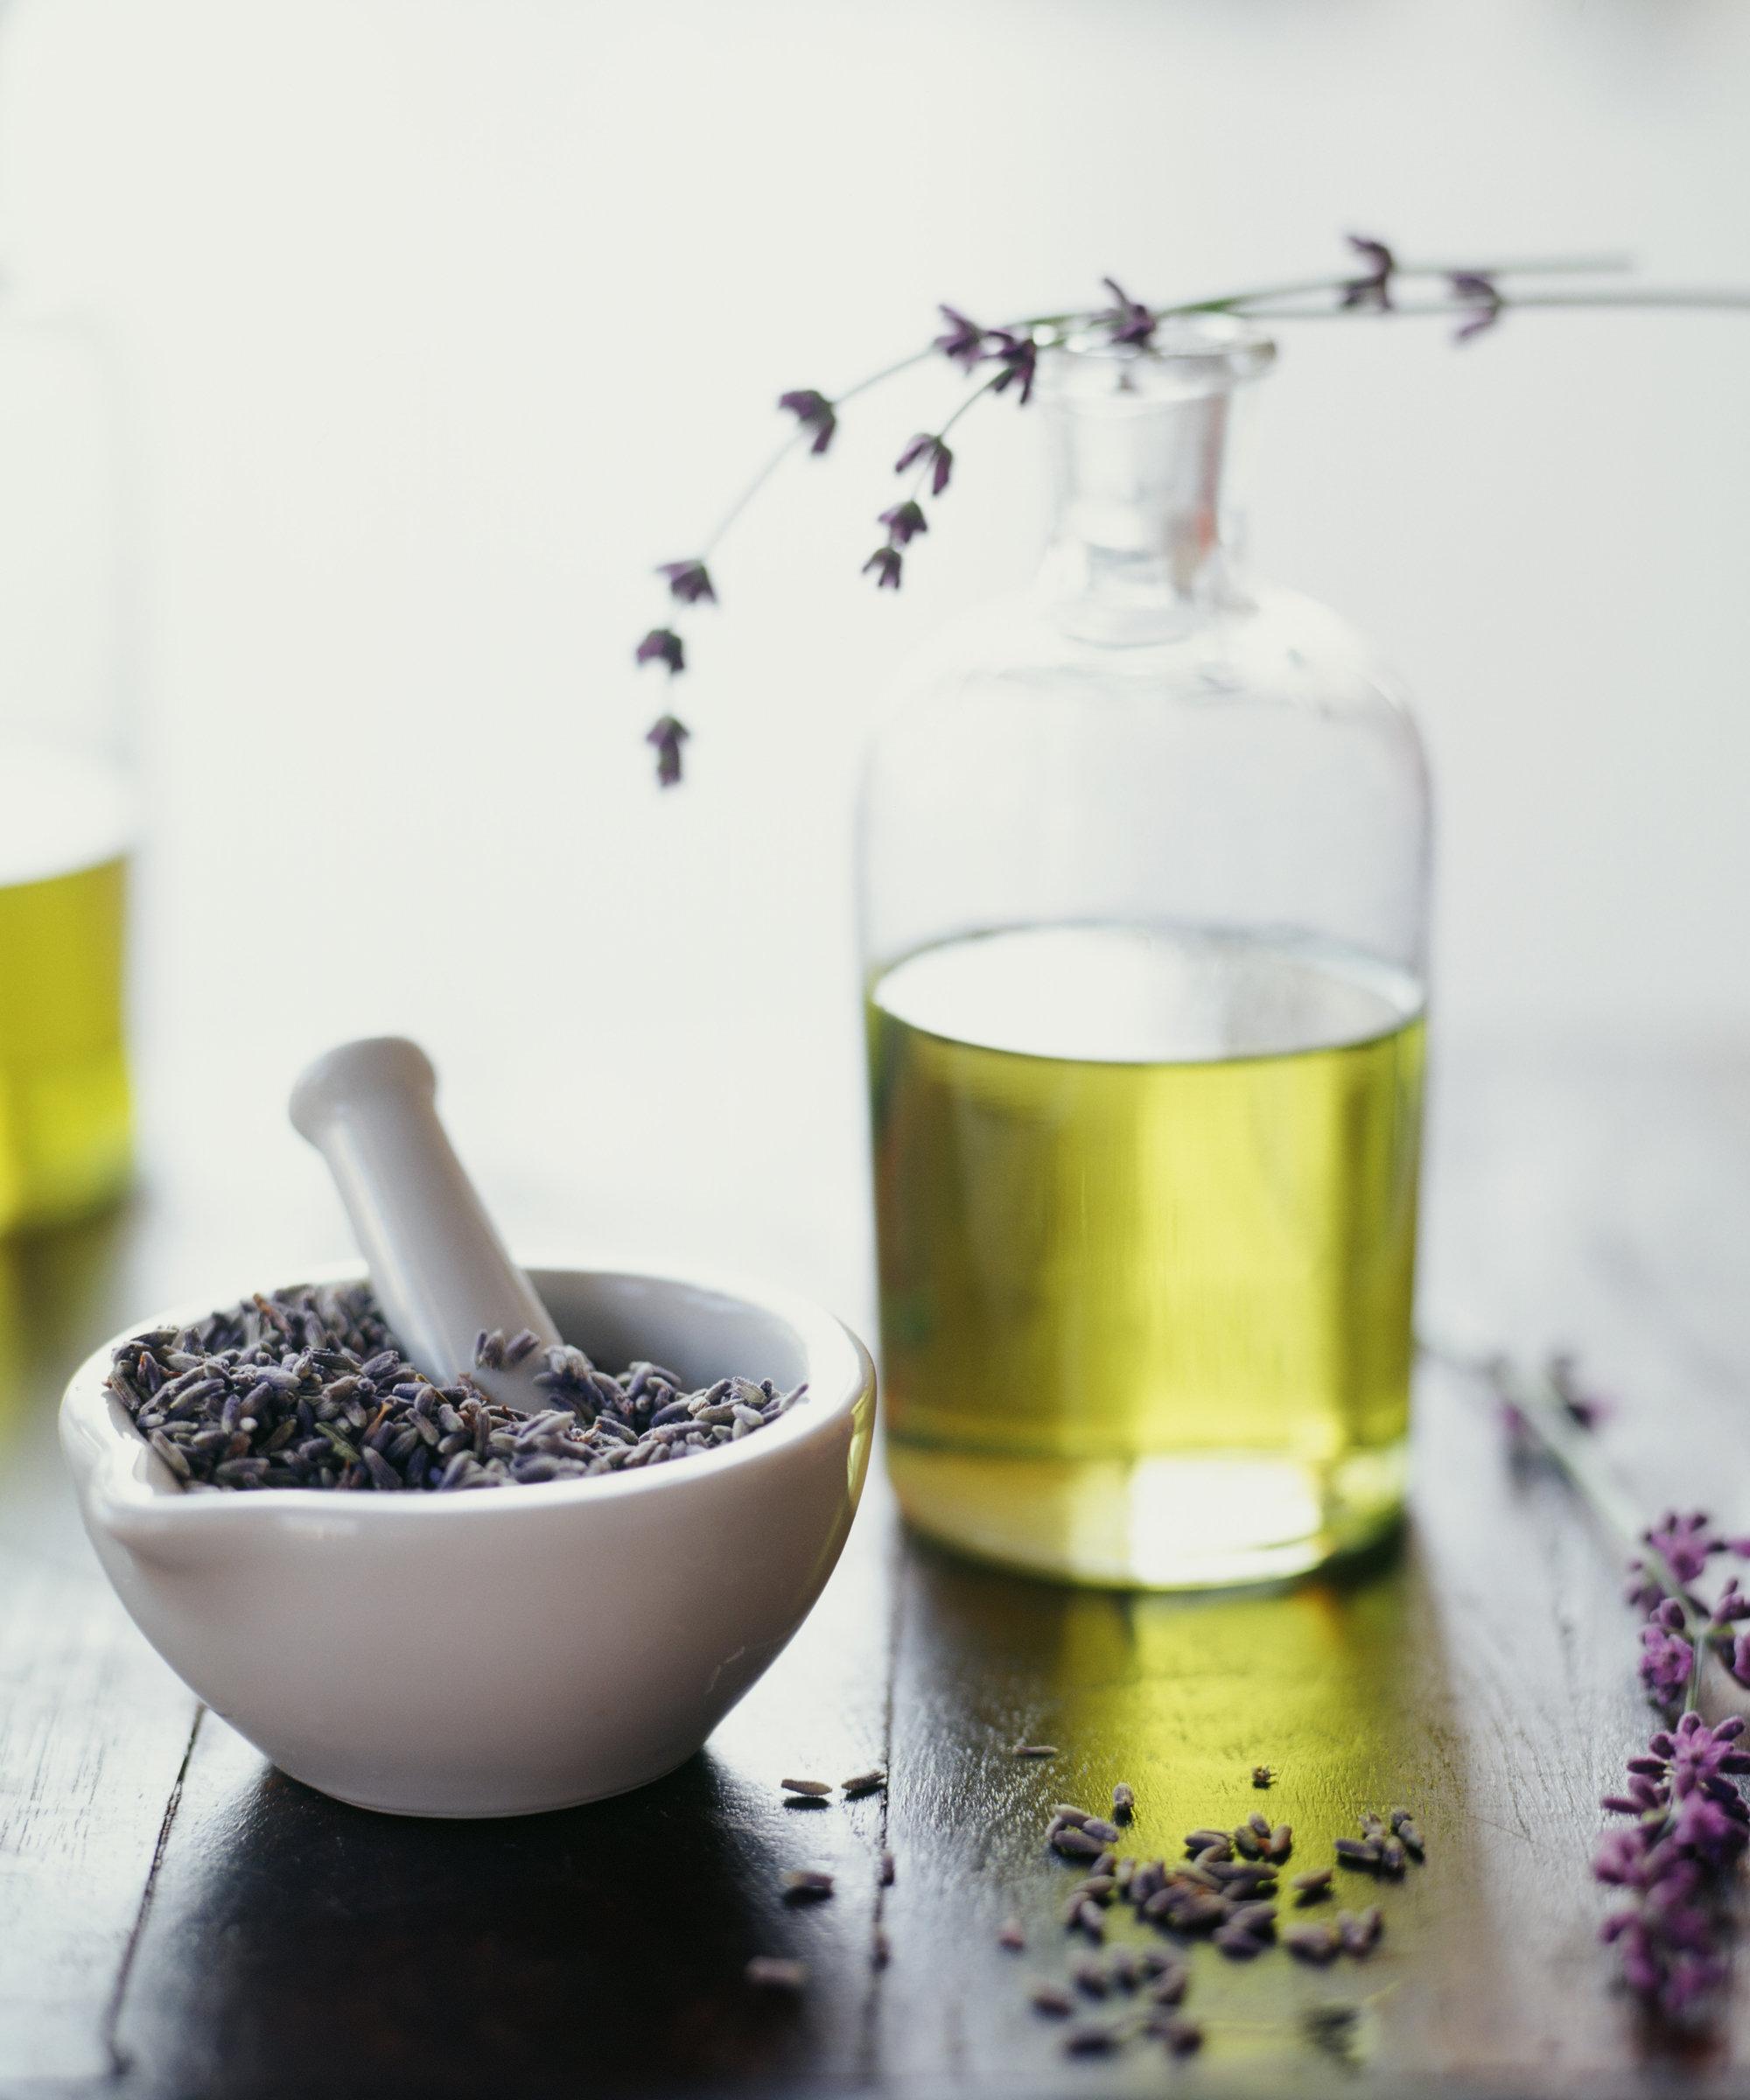 092316-lavender-aromatherapy.jpg